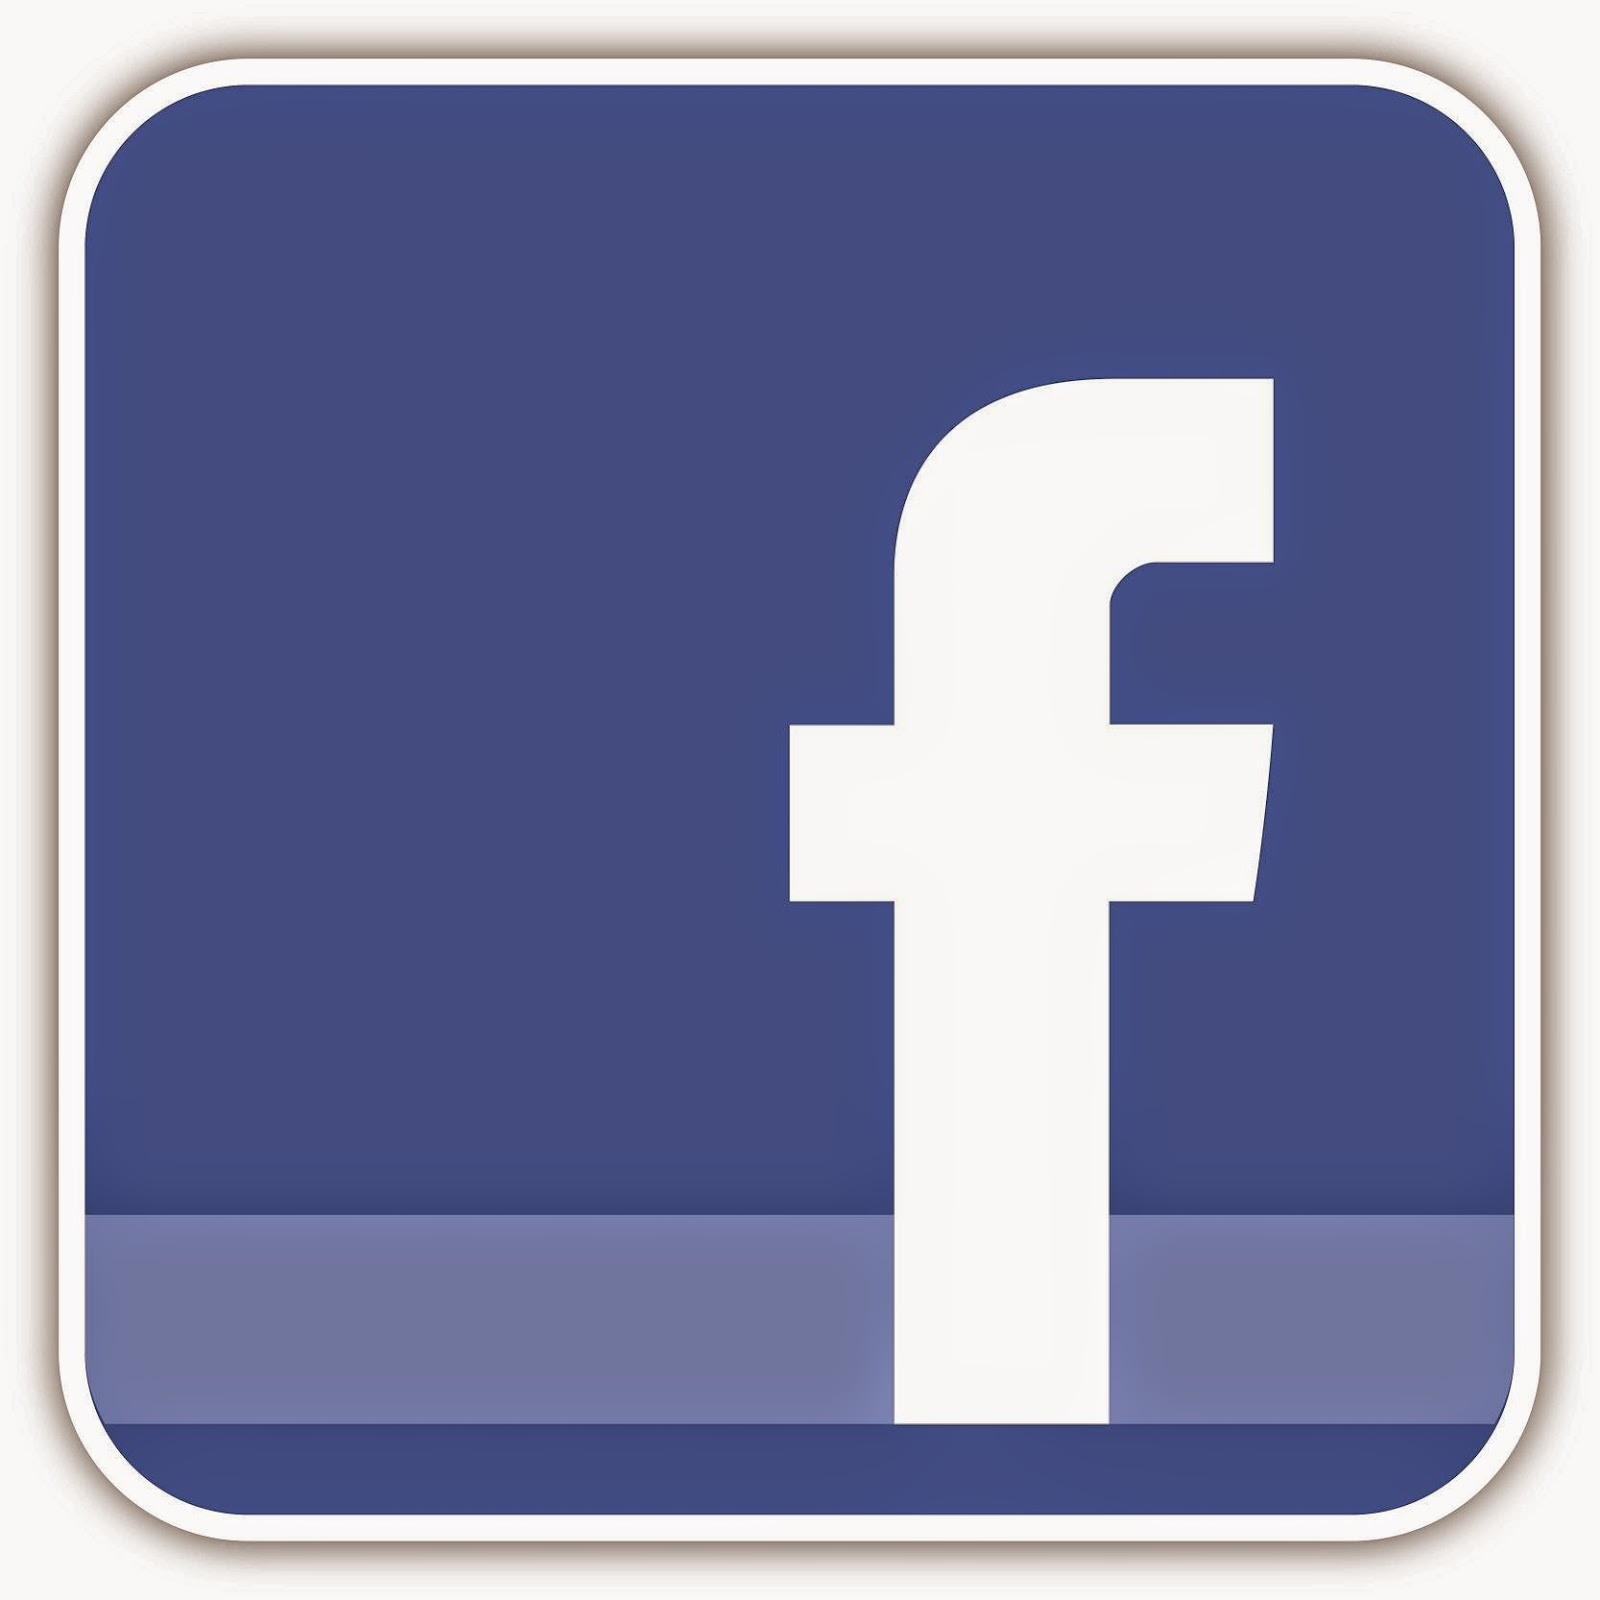 all facebook pages - desi unit - desi stuff - desi hip hop - the hip hop